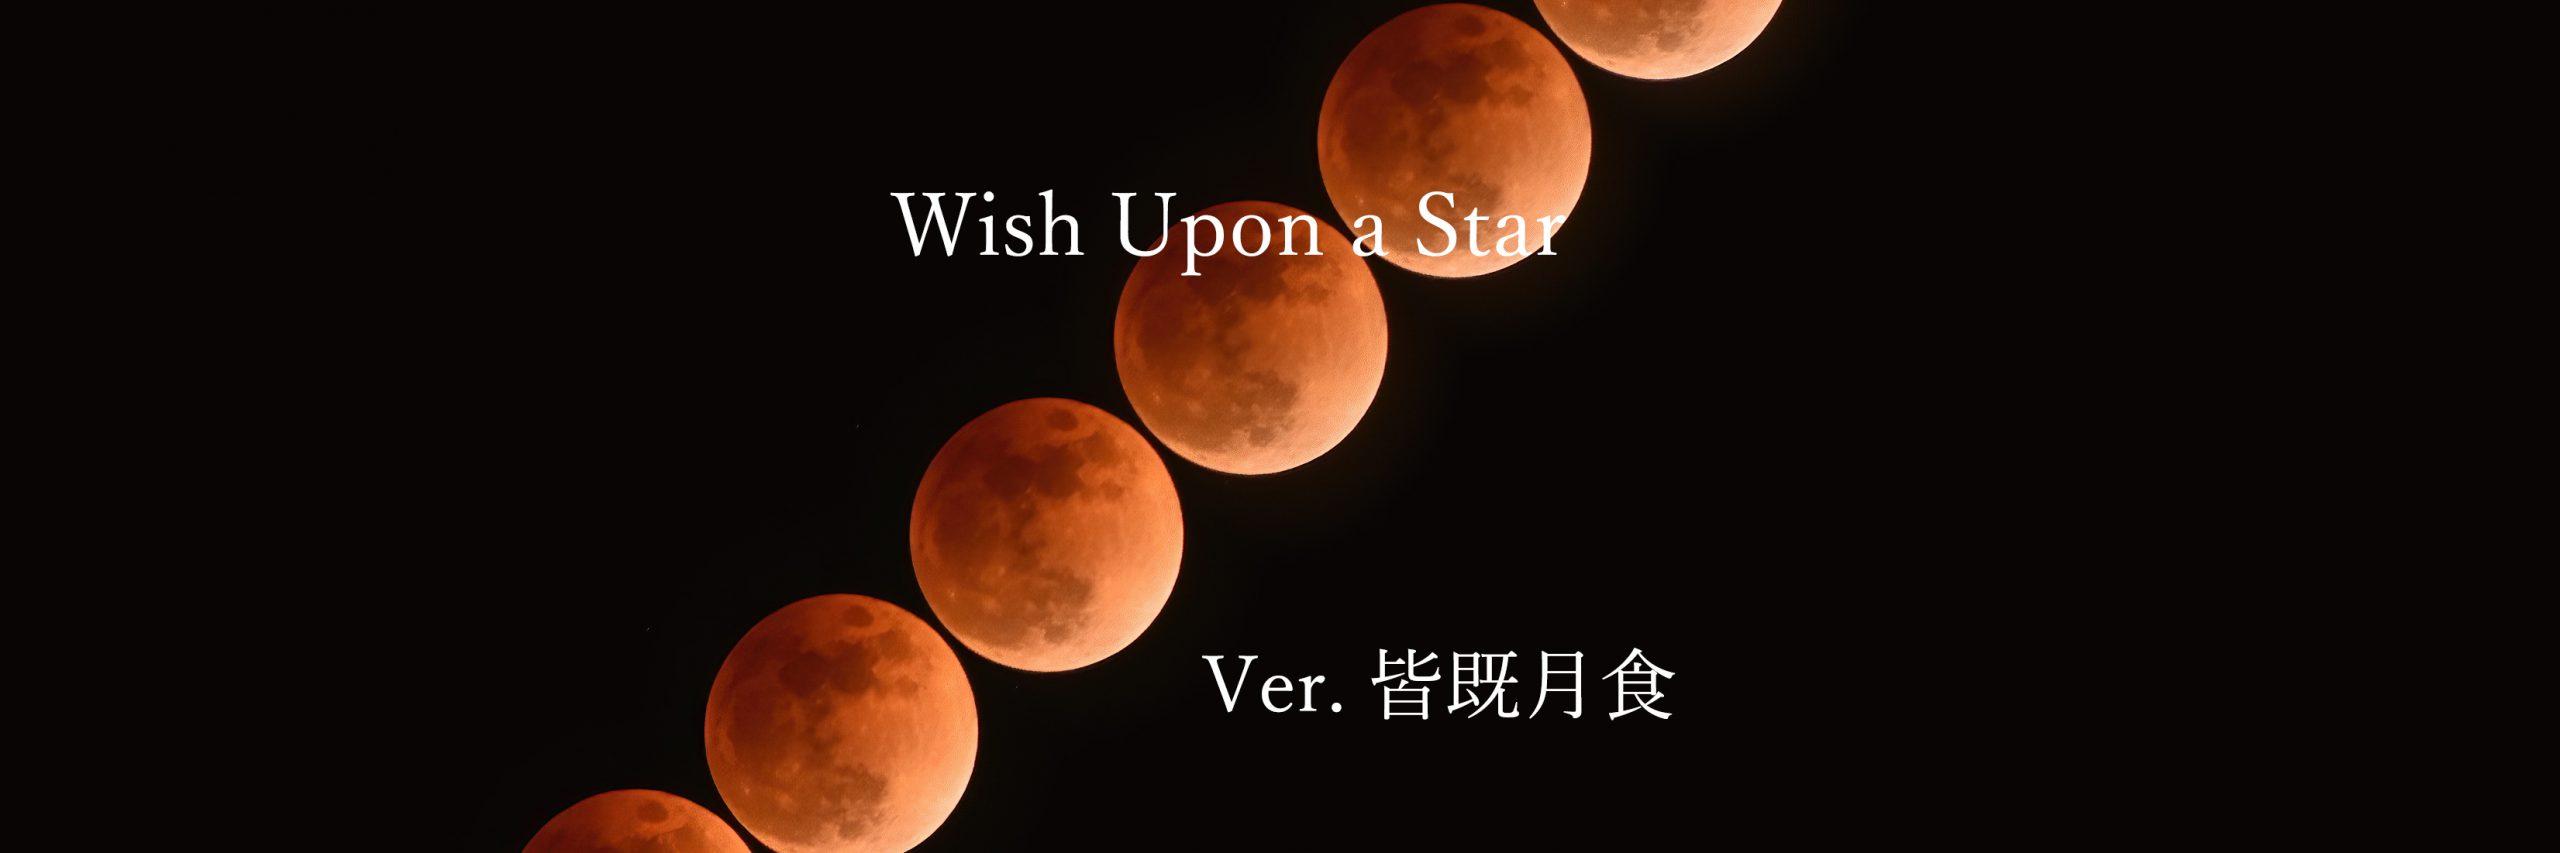 【Wish Upon a Star】皆既月食を撮ろう